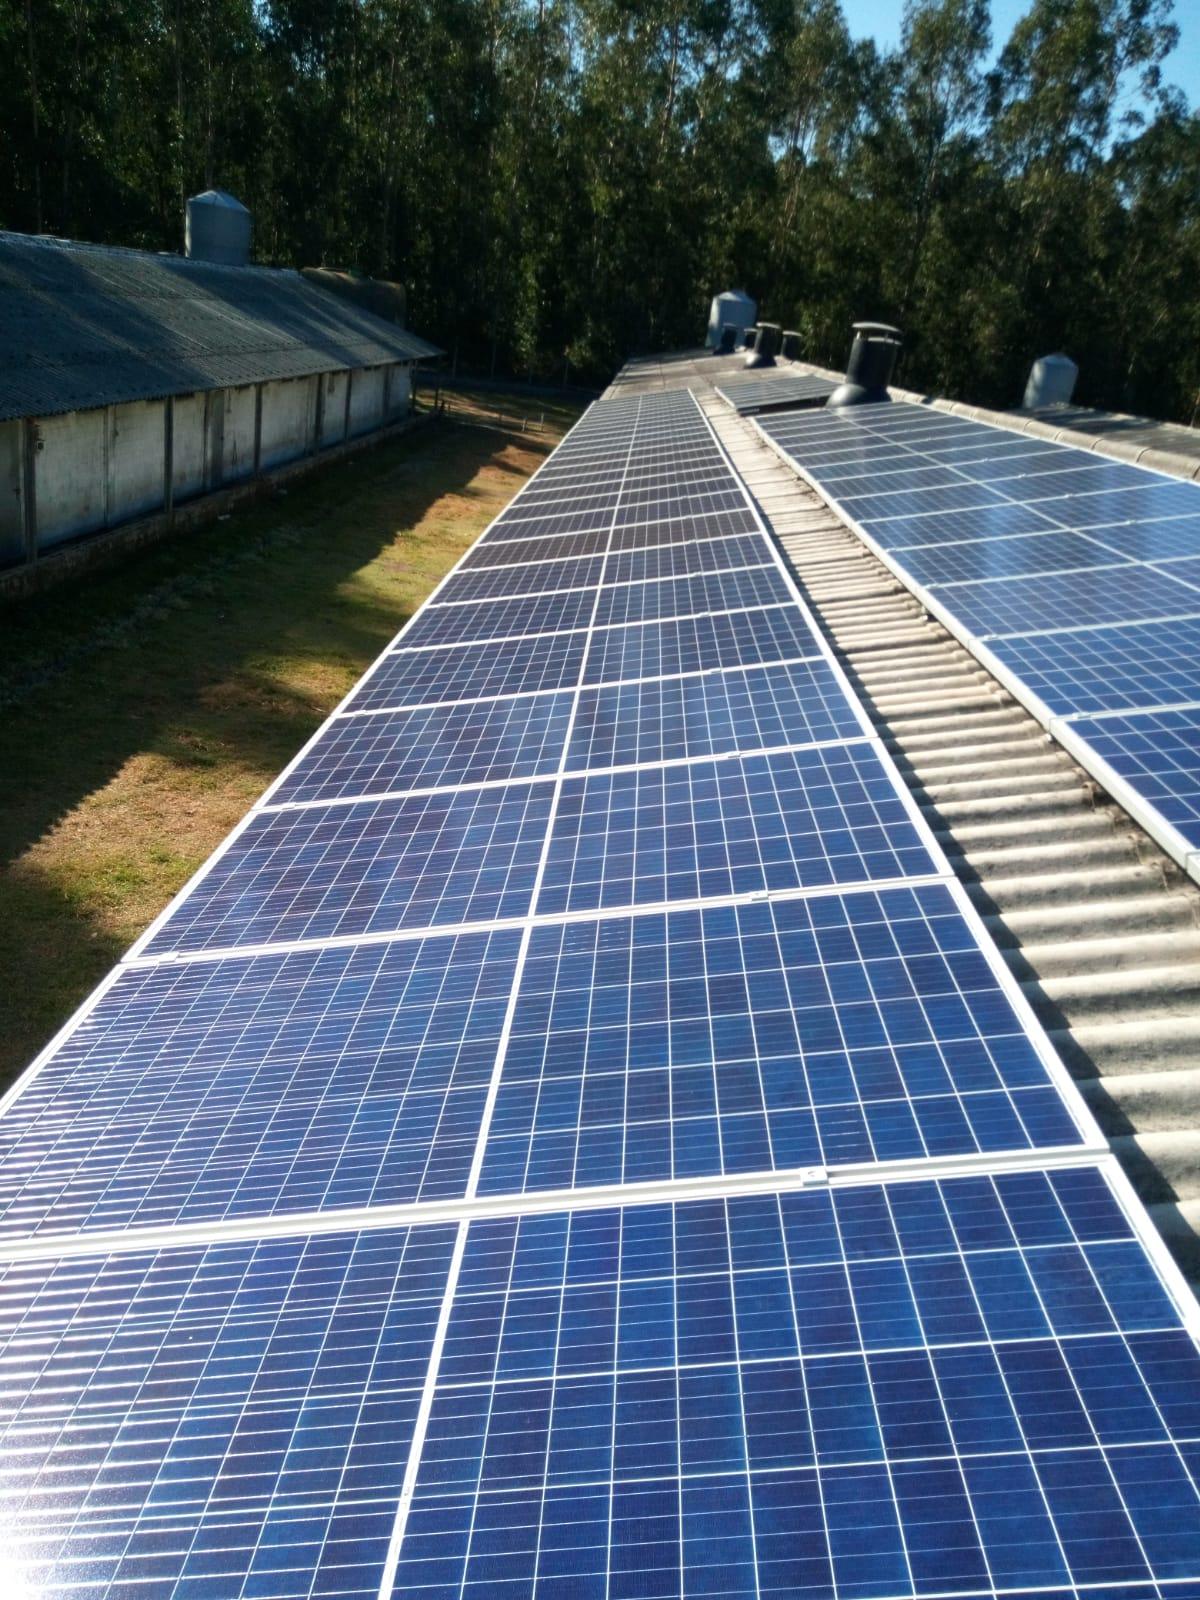 Fotovoltaica en granja galicia